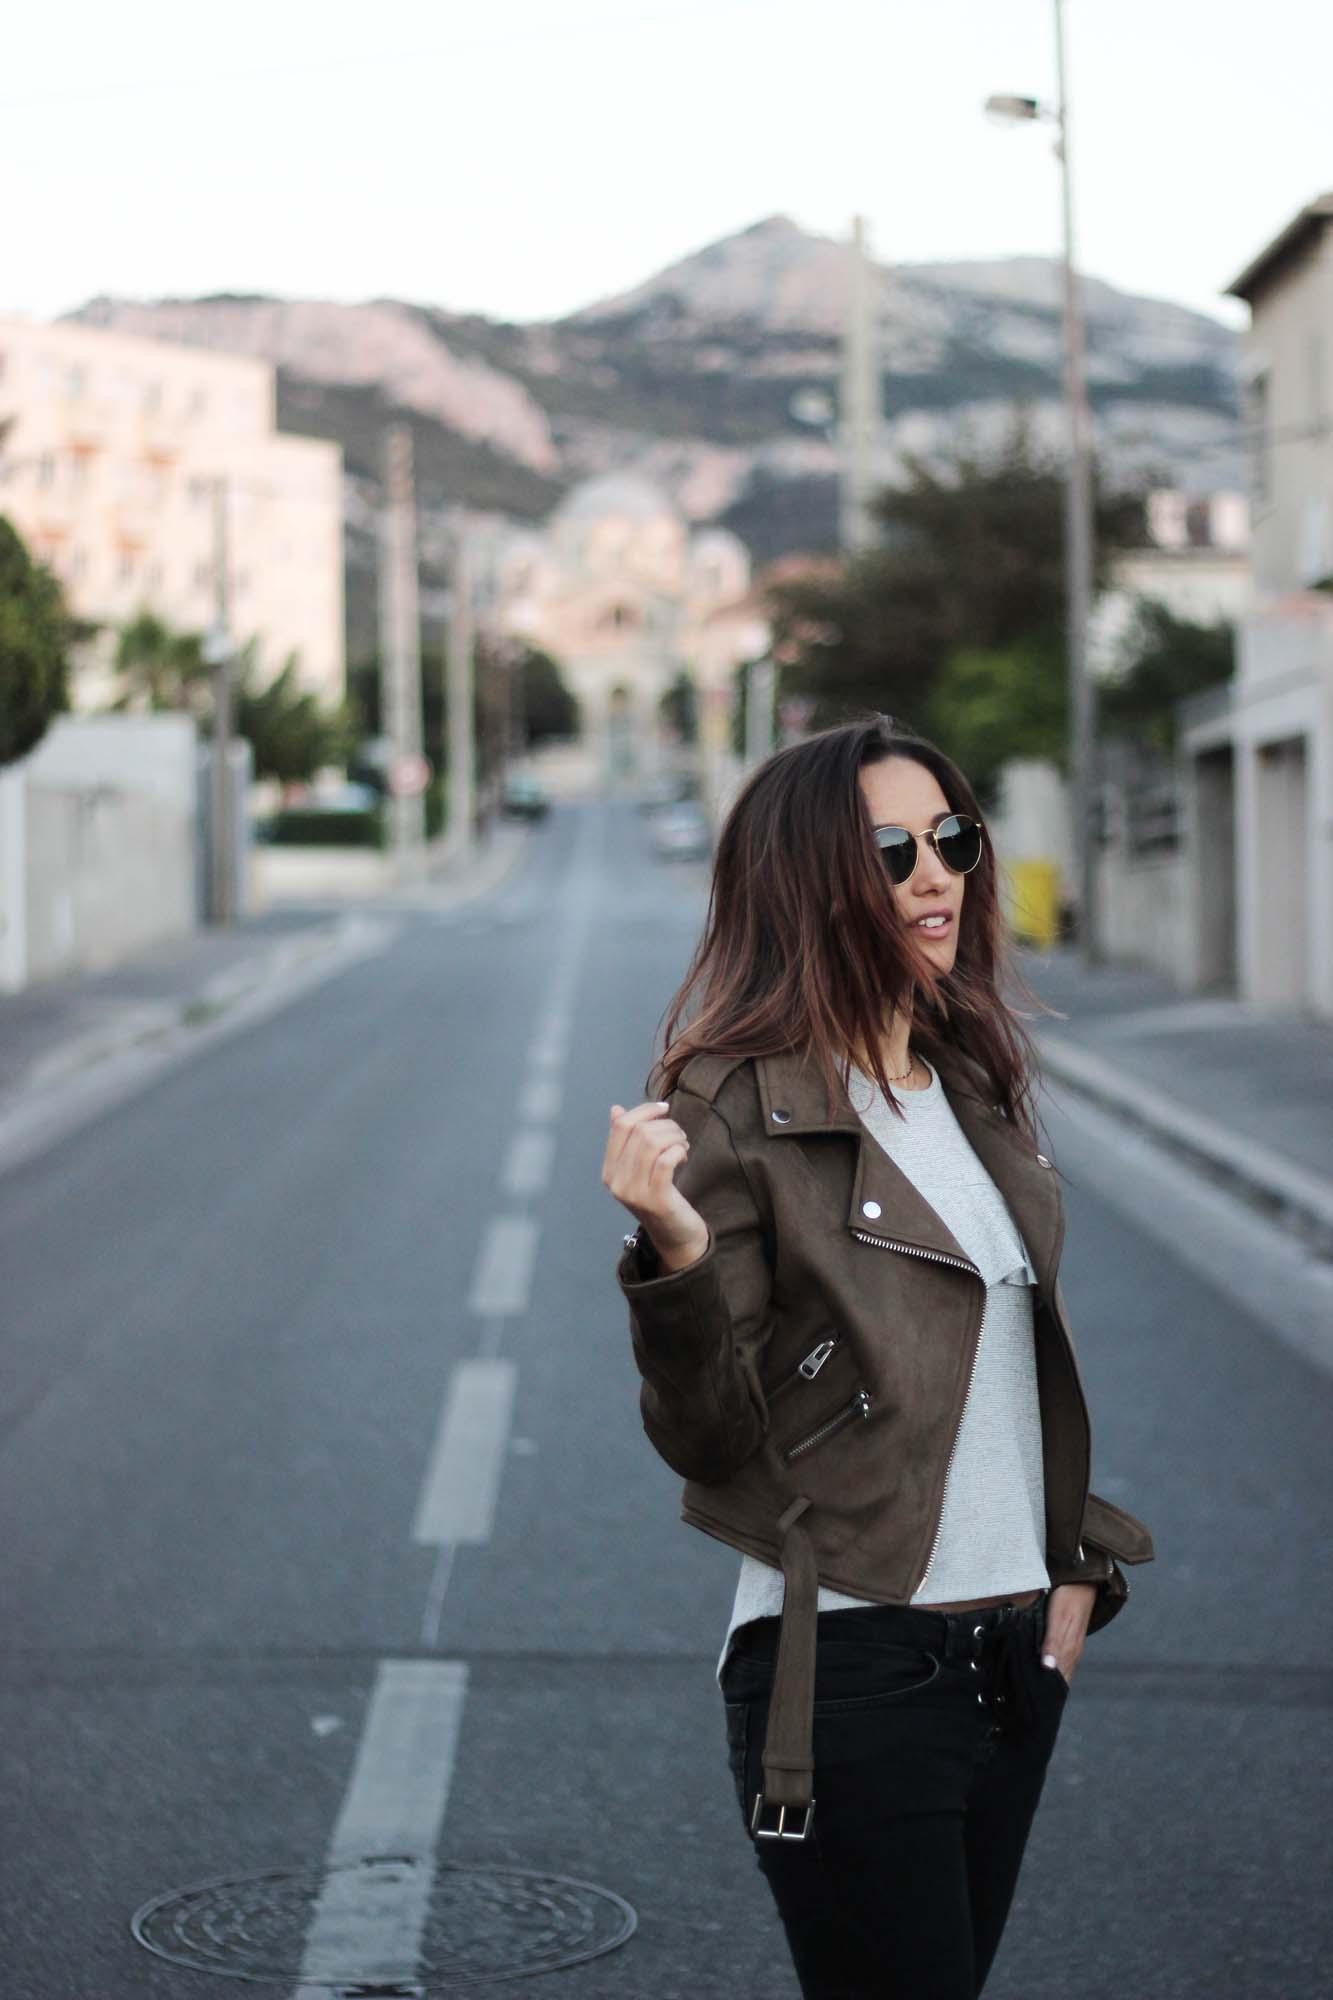 blog-mode-comment-porter-perfecto-daim